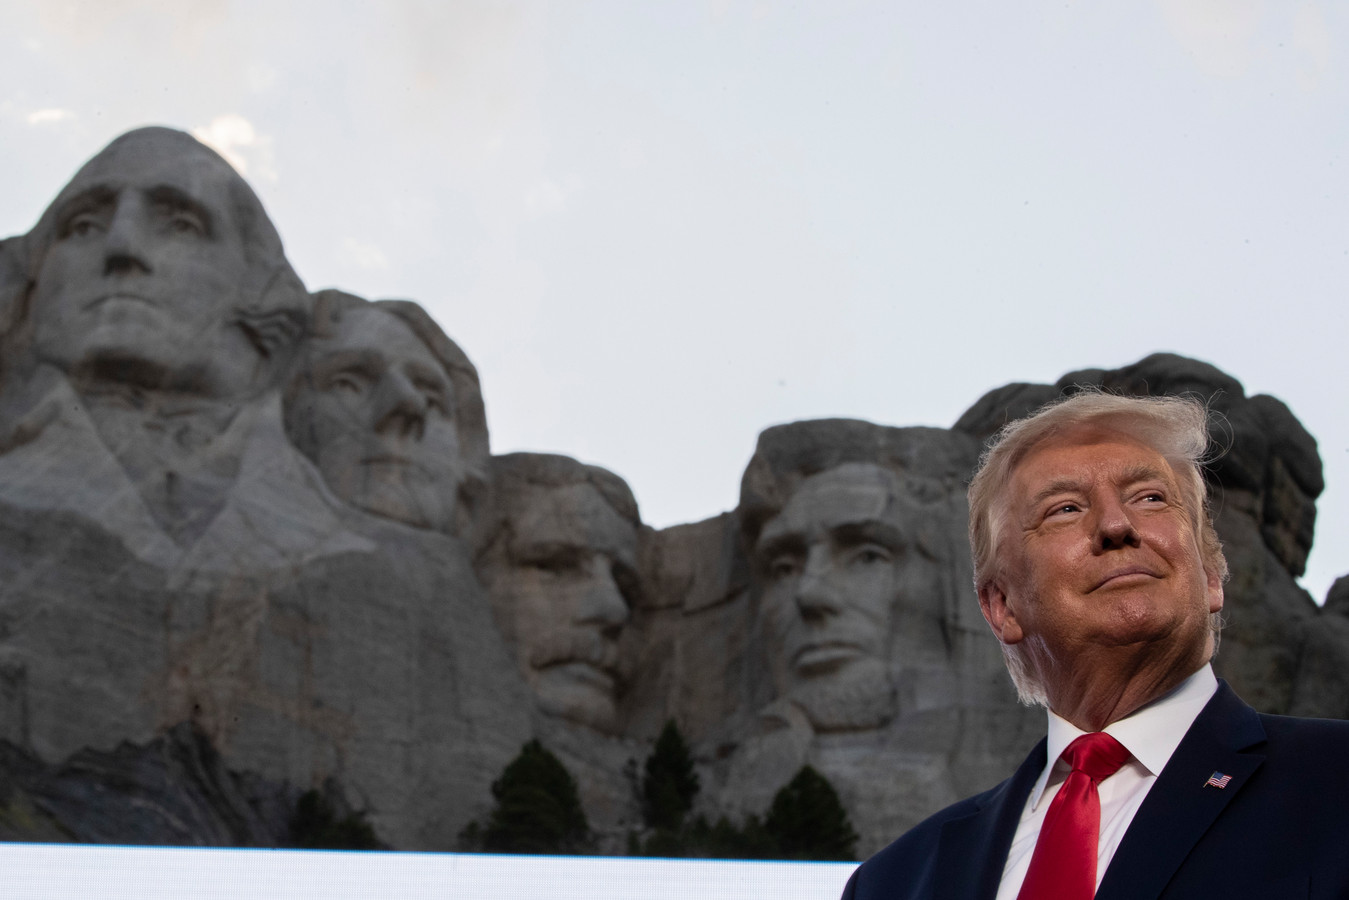 President Donald Trump bij Mount Rushmore.